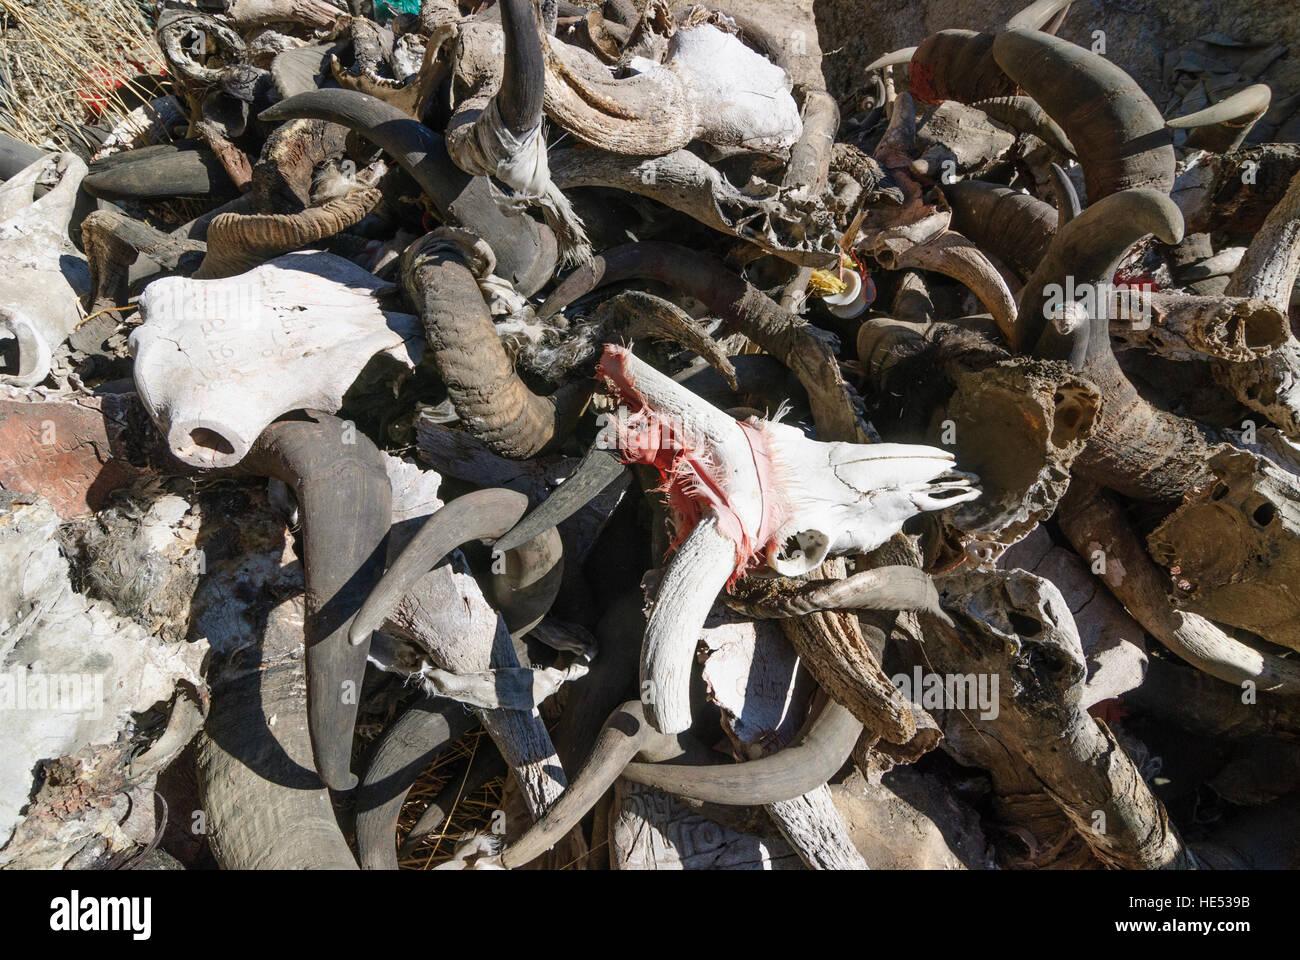 Lhasa: Monastery Sera; Kora (pilgrimage route) around the monastery; Pile of sheep and yak skulls as sacrifices, - Stock Image